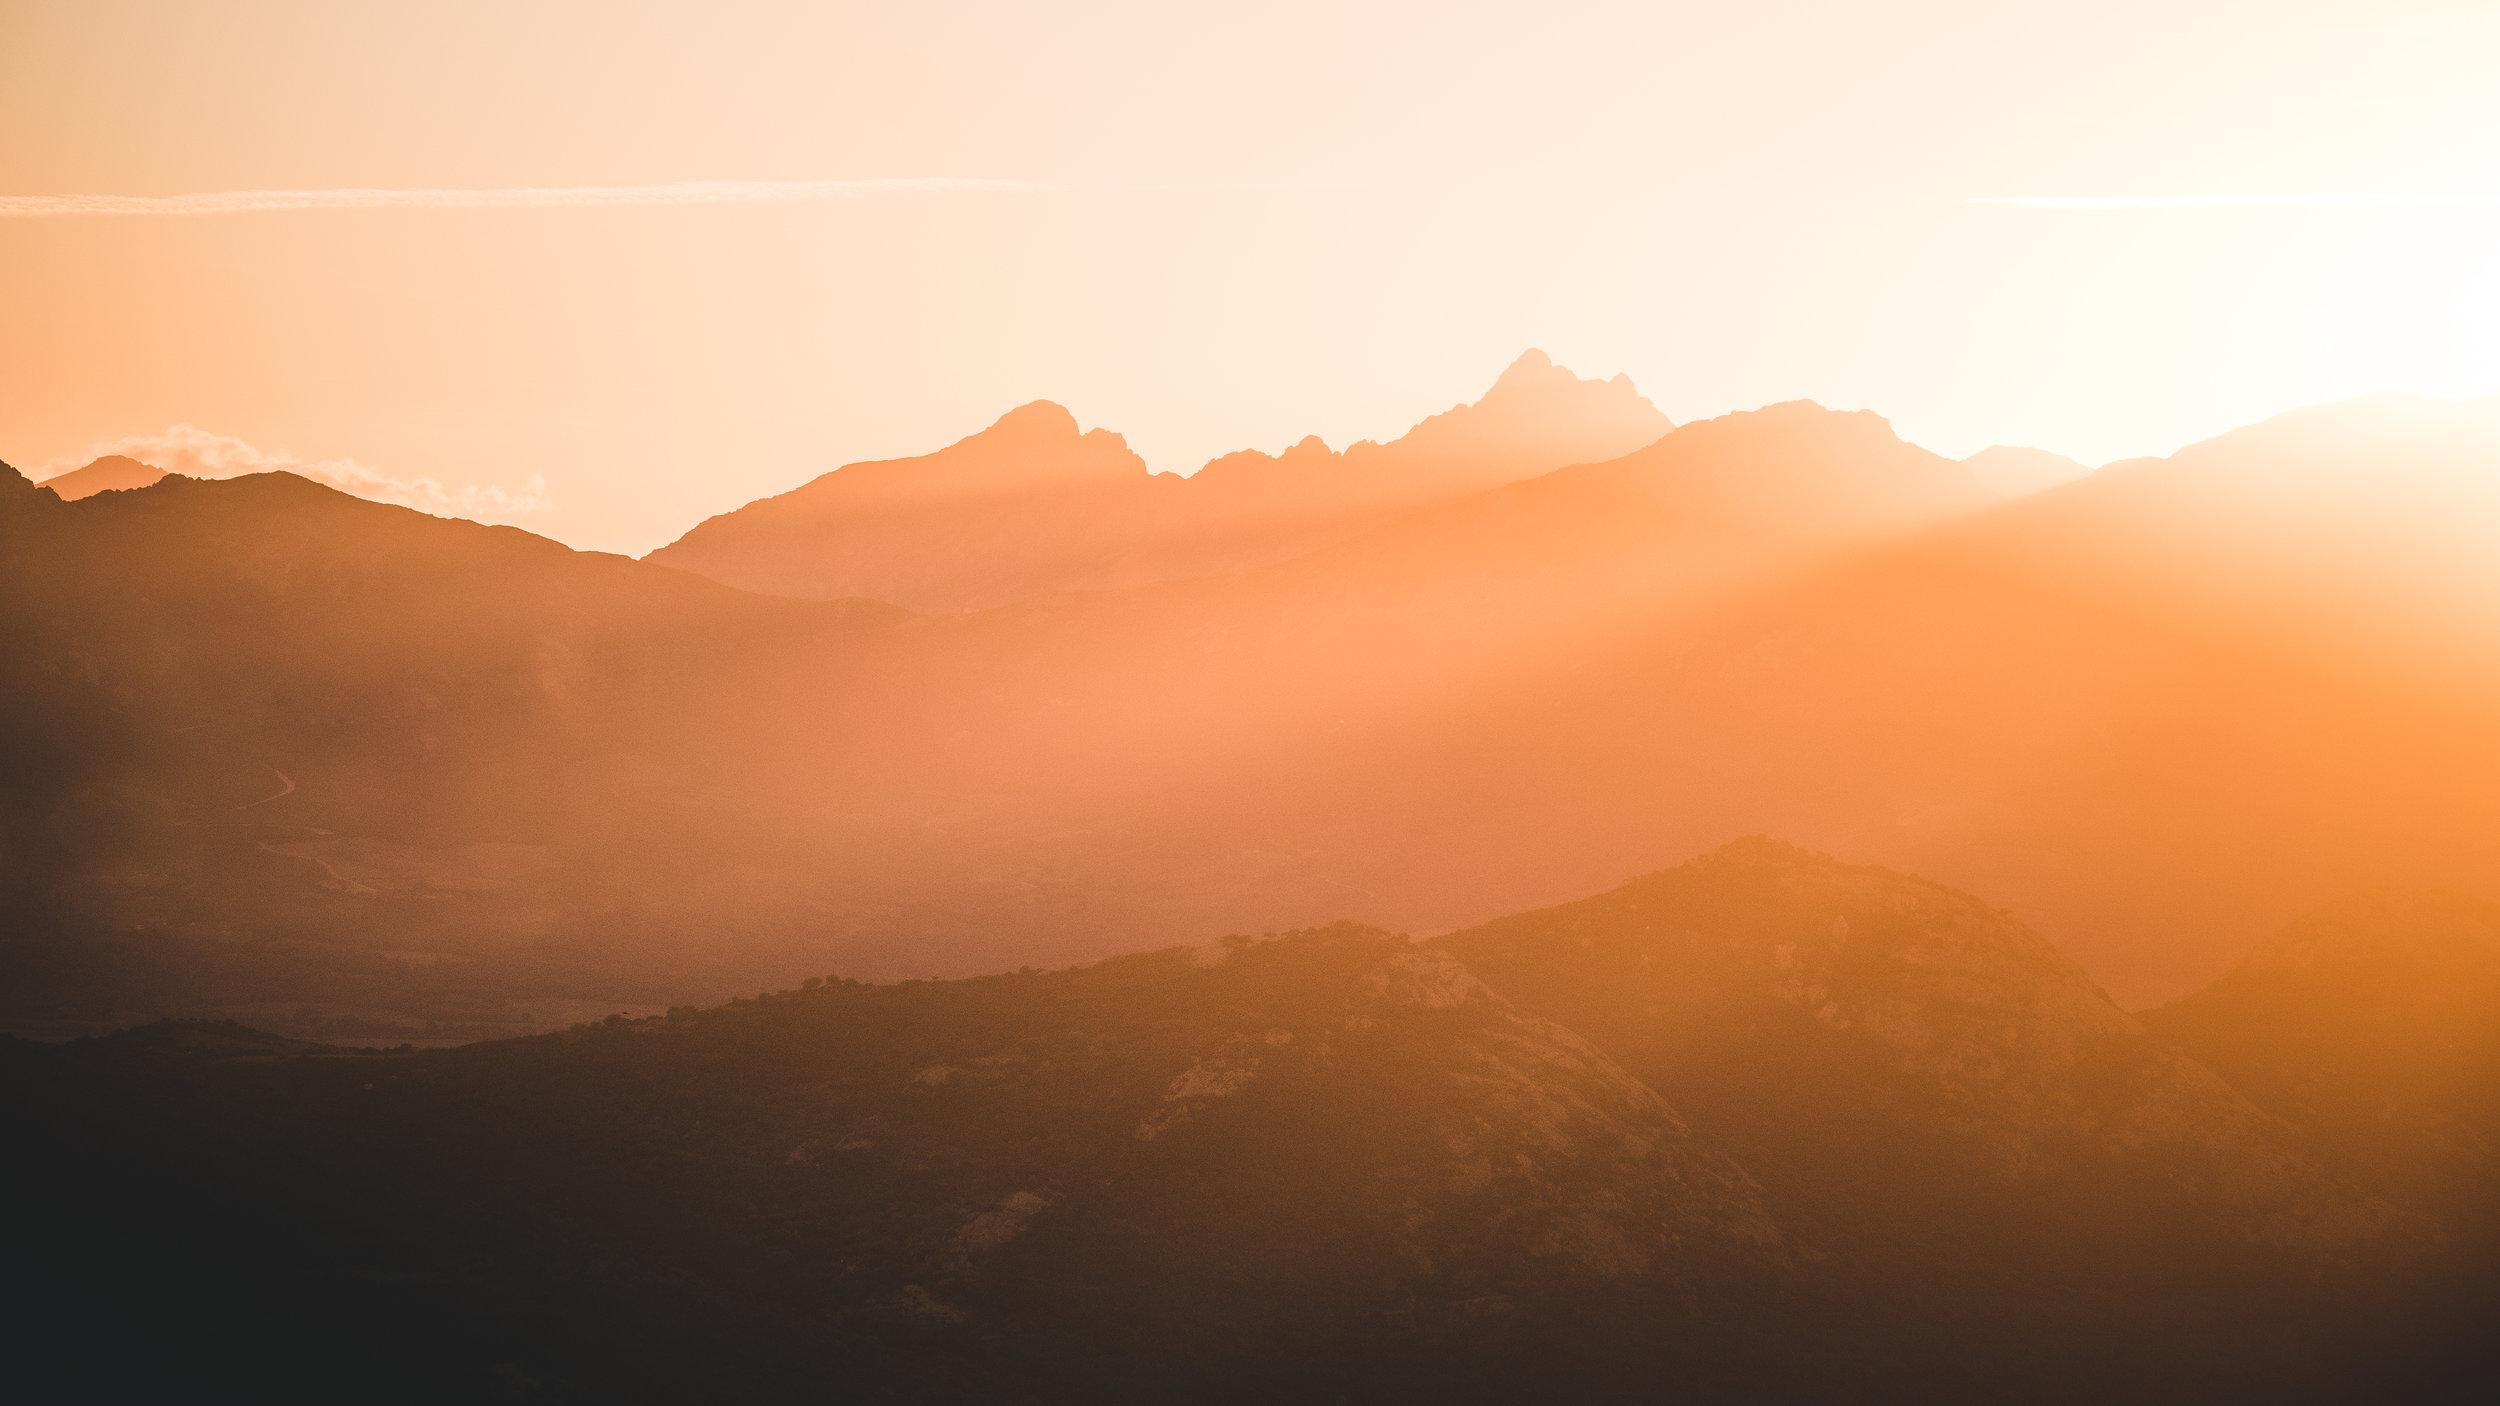 Sunset light in the Balagne region